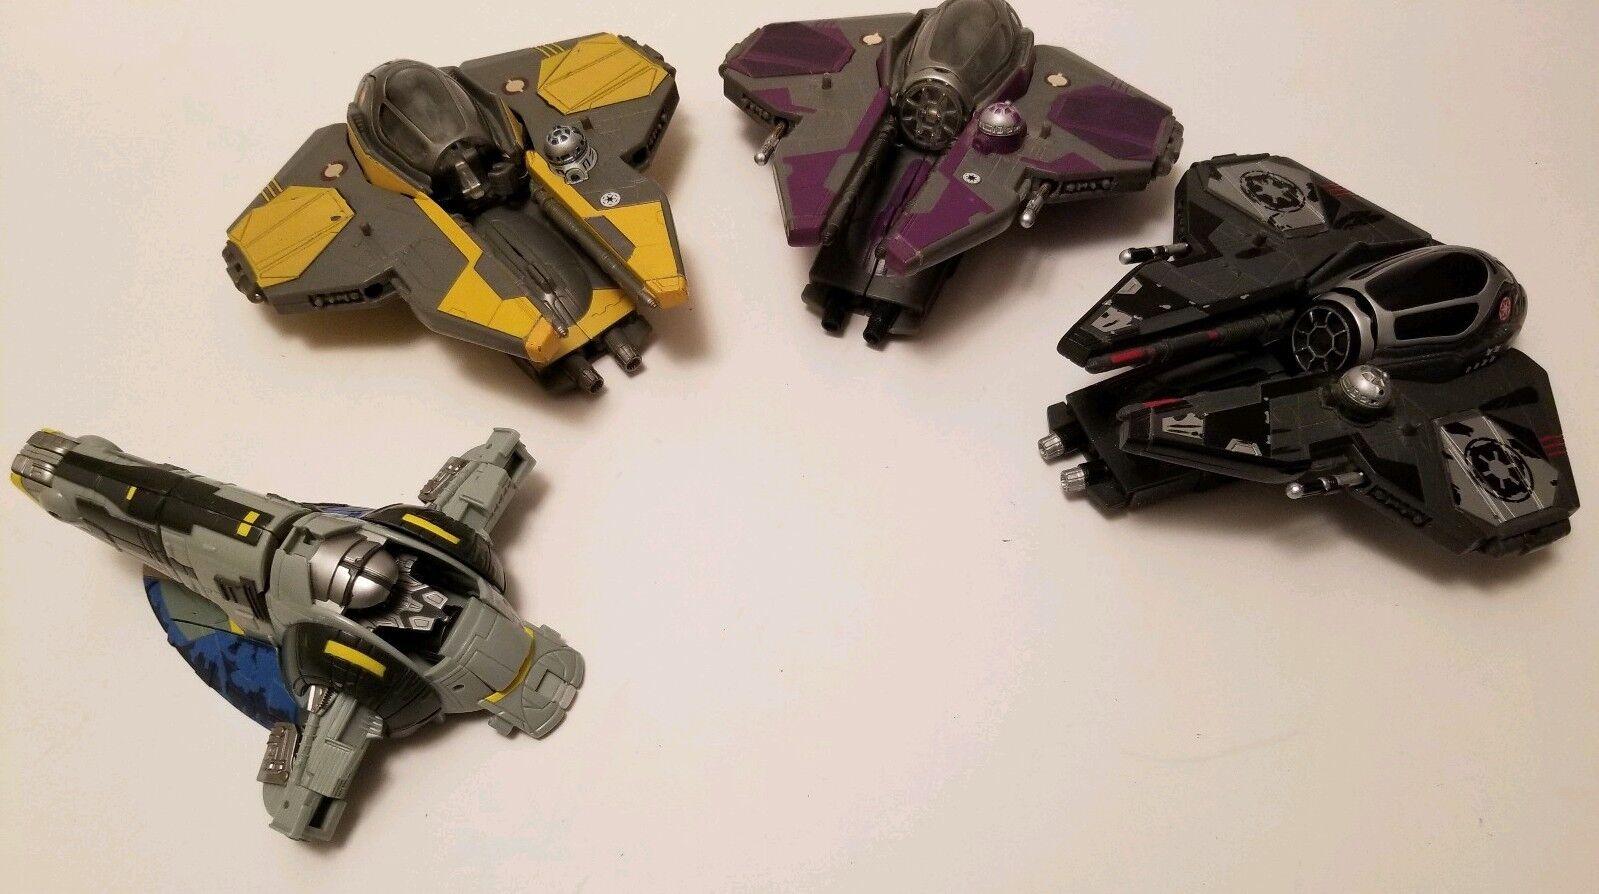 Star Wars Transformers Robot Interceptor lot of 4 LFL w Vader mini 2 incomplete